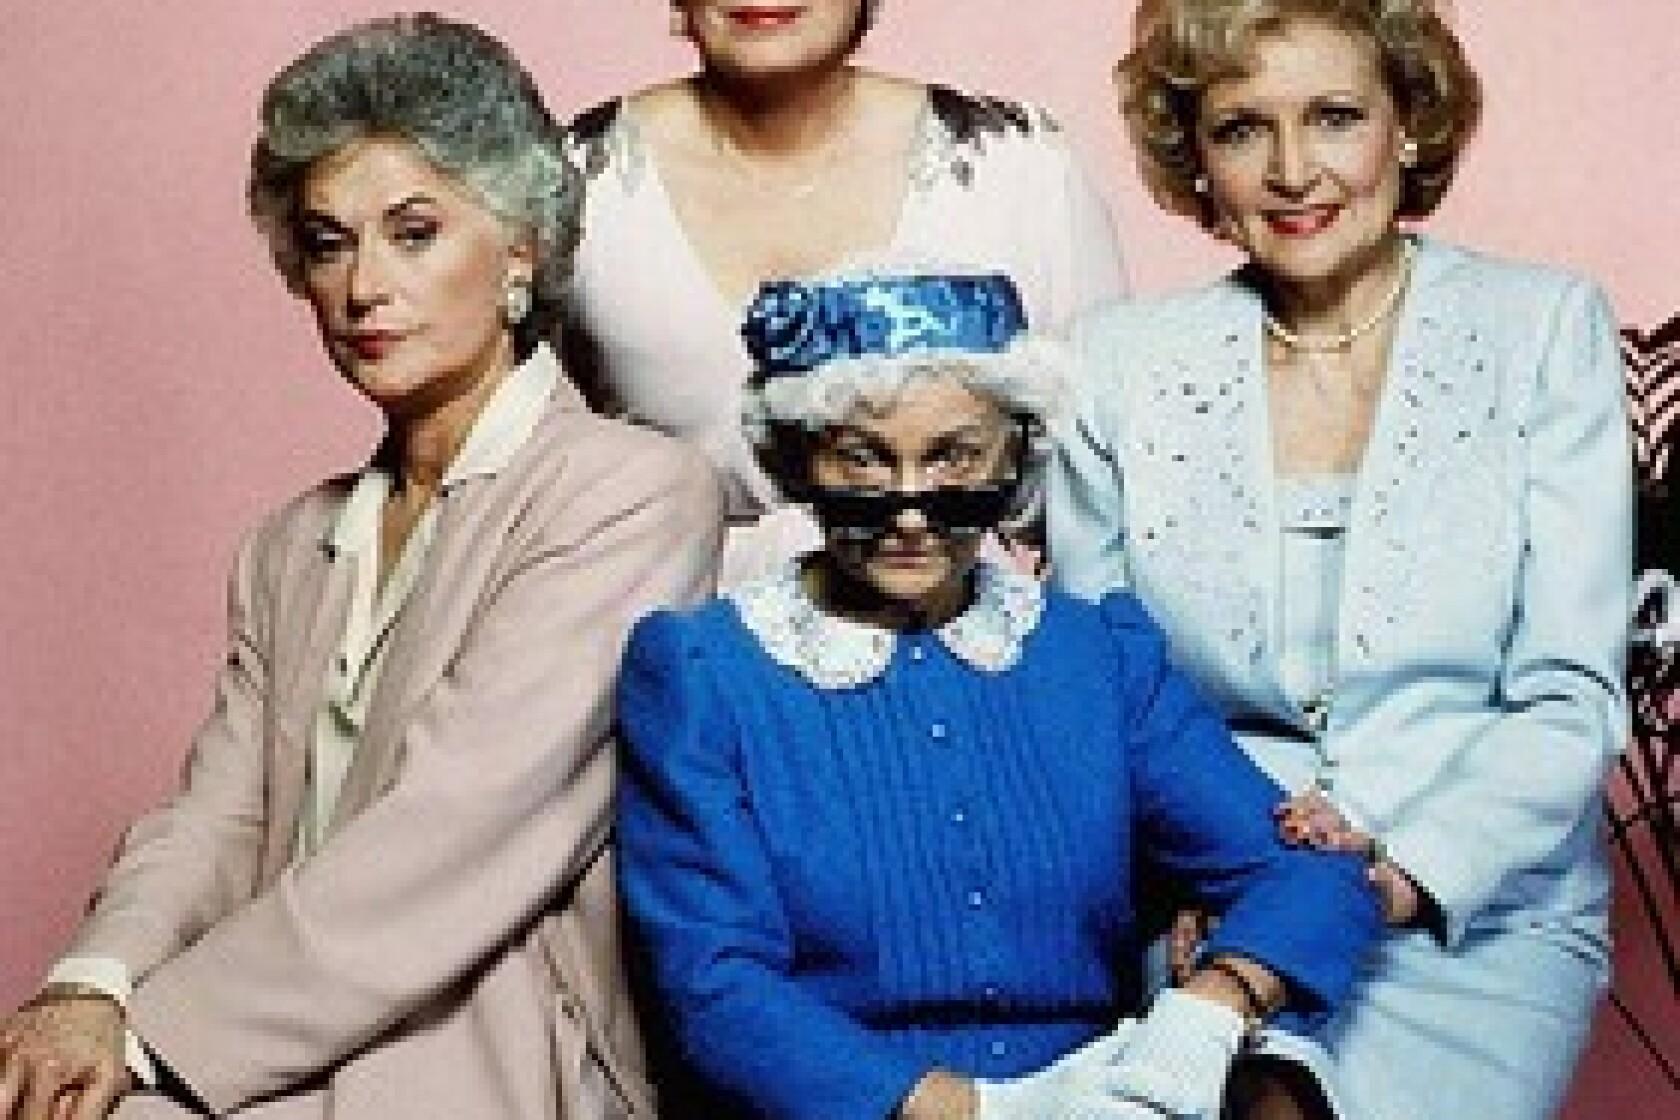 Bea Arthur, star of 'Golden Girls' and 'Maude' dies at 86